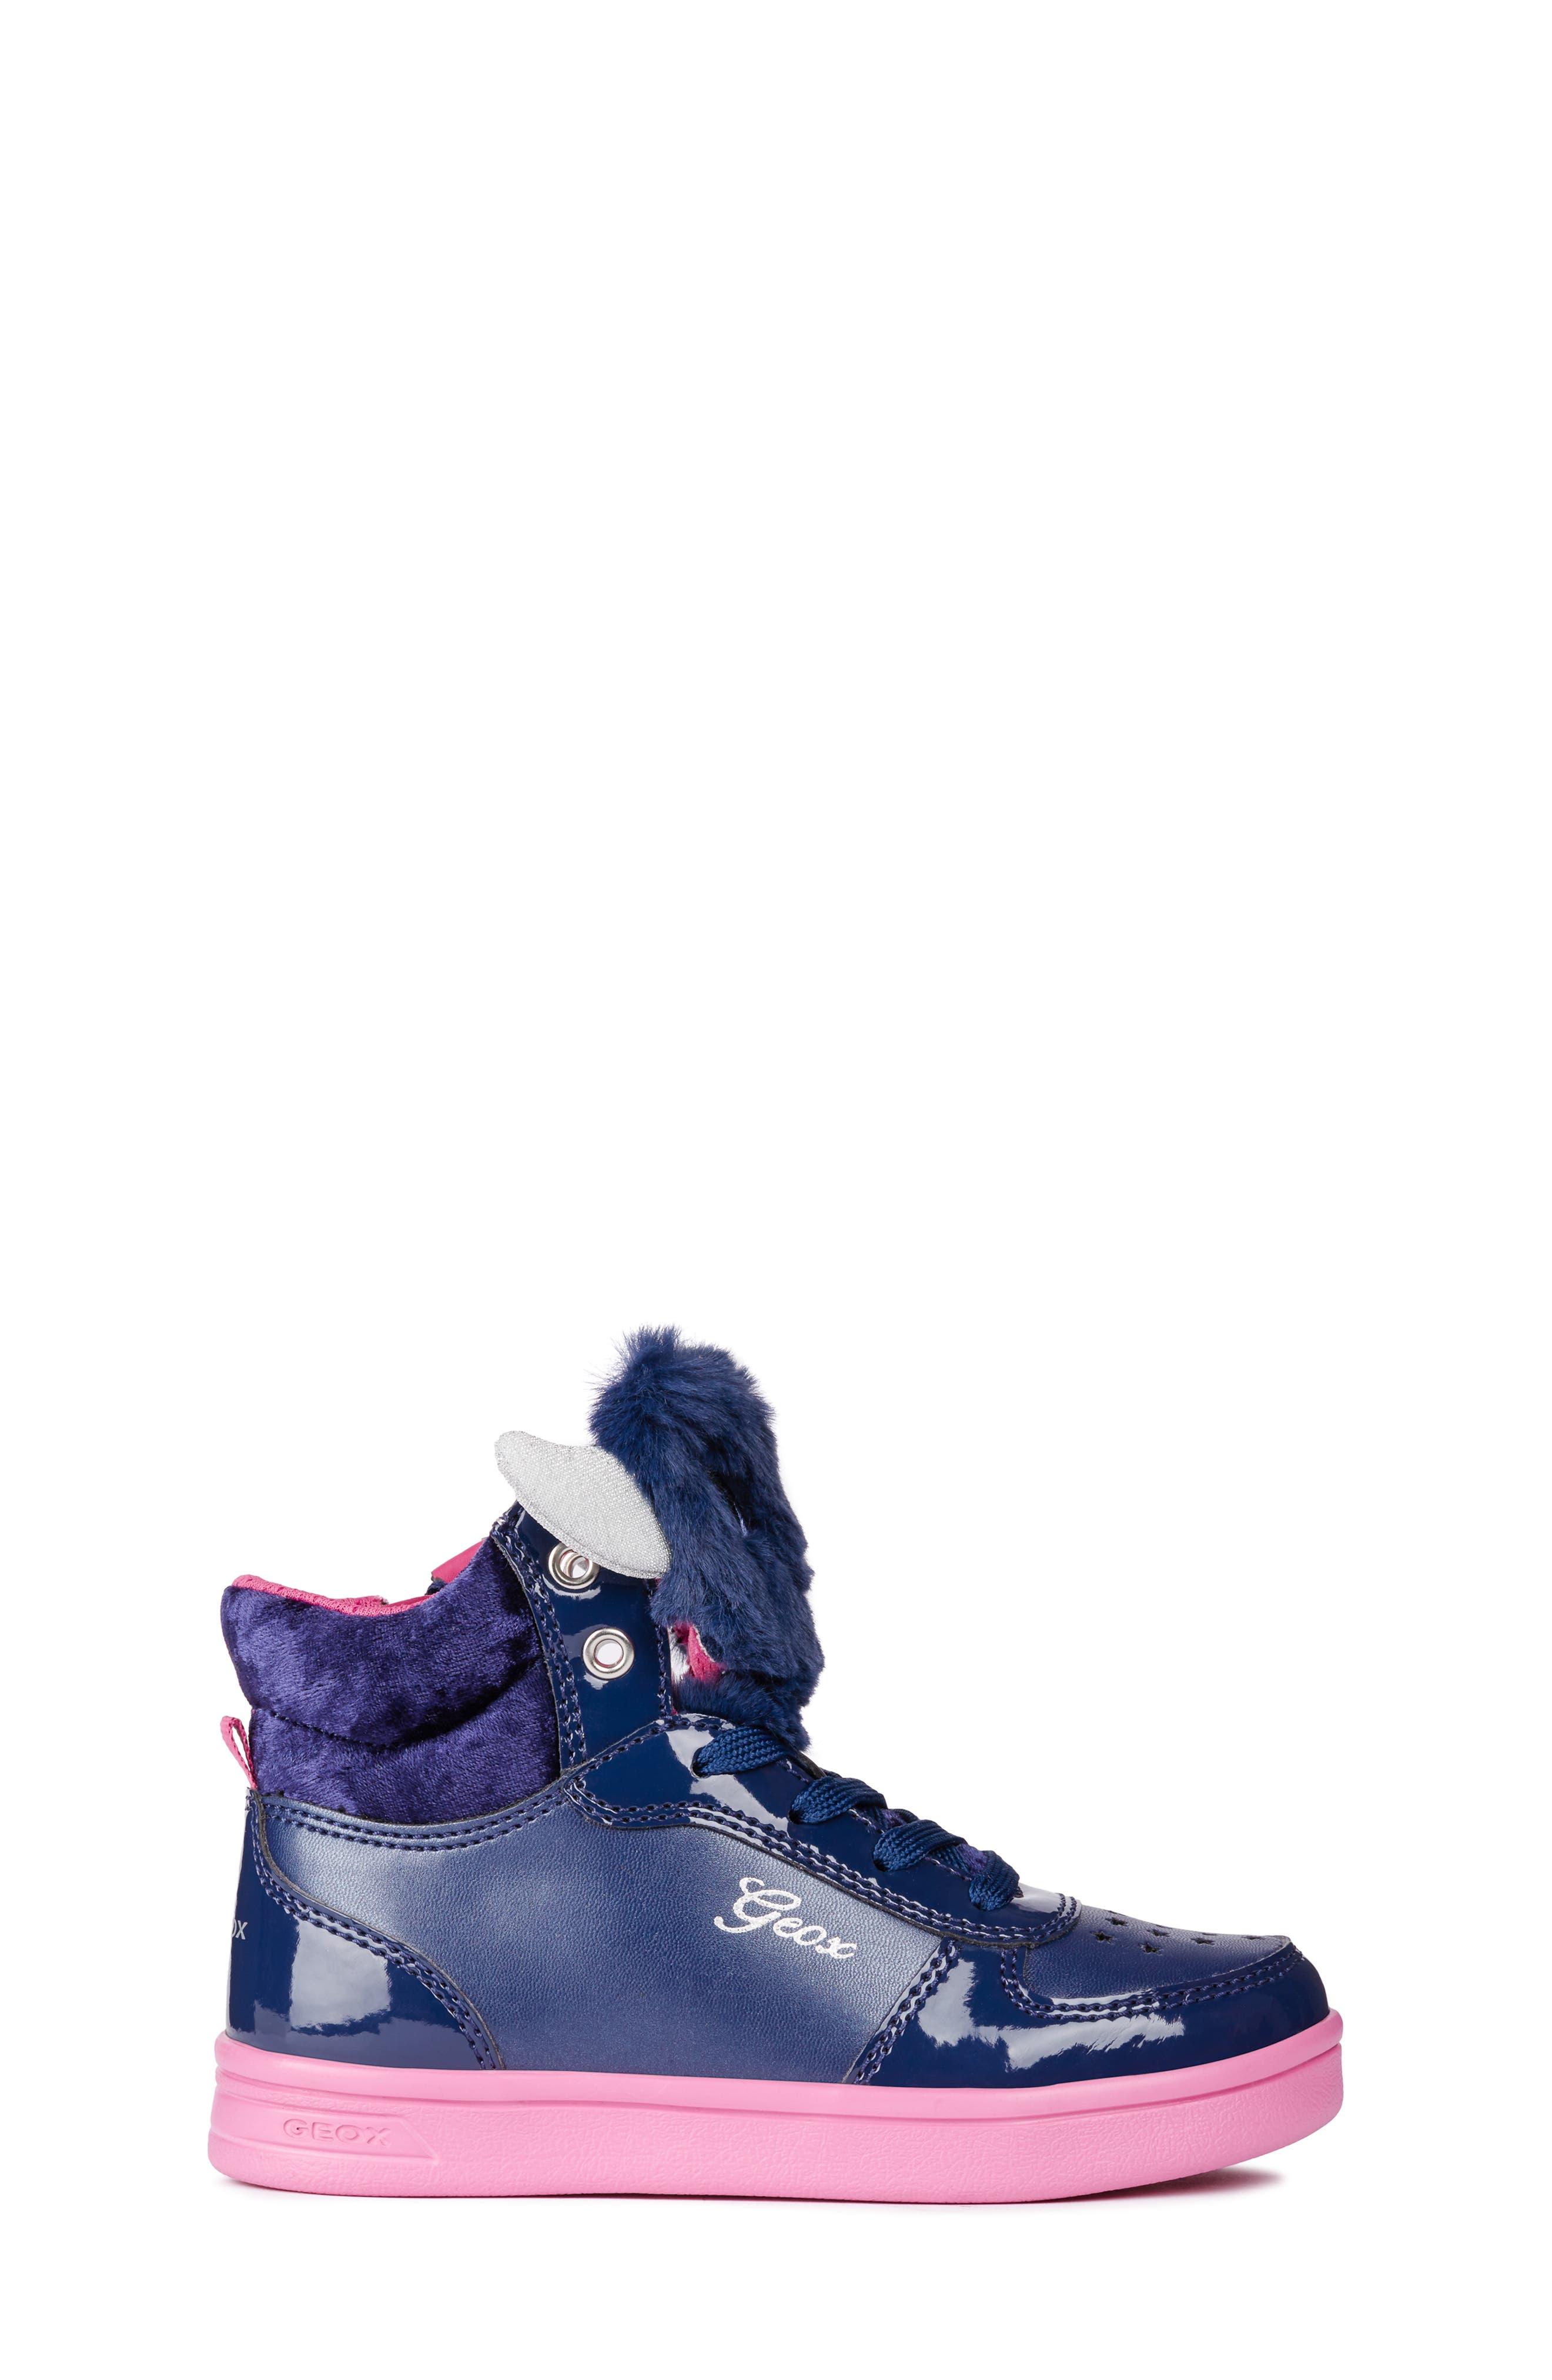 DJ Rock Fuzzy Friend Sneaker,                             Alternate thumbnail 3, color,                             NAVY/FUCHSIA